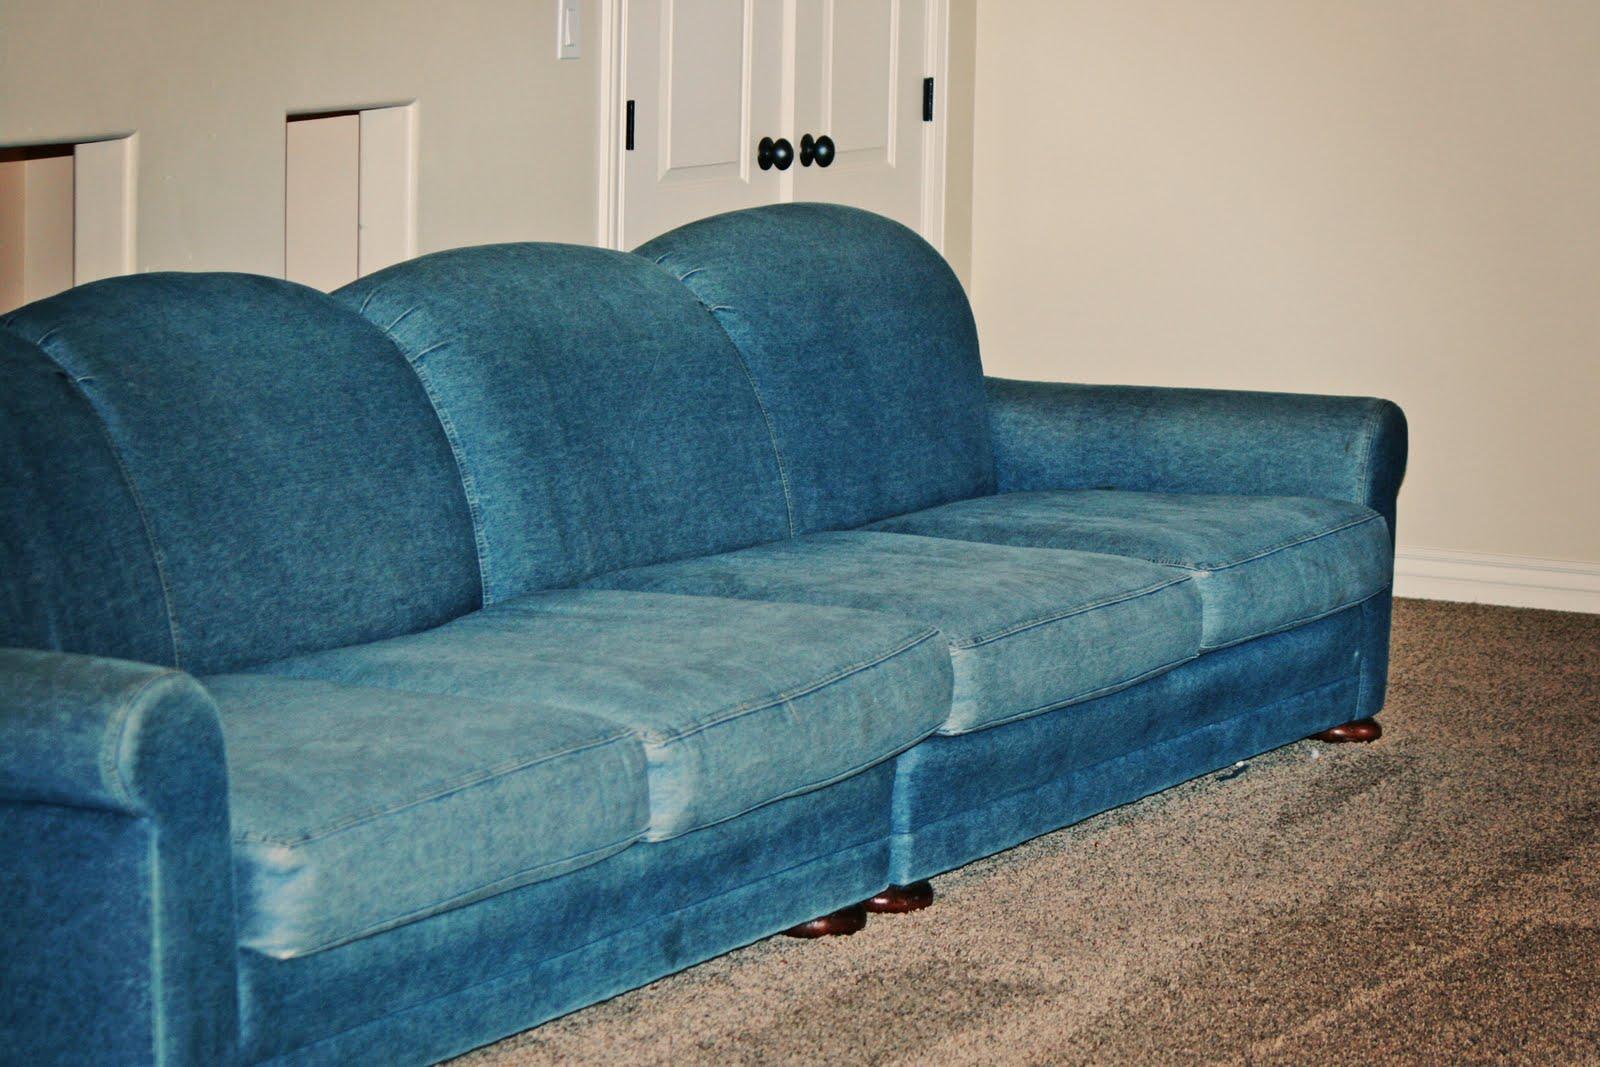 bull denim couches